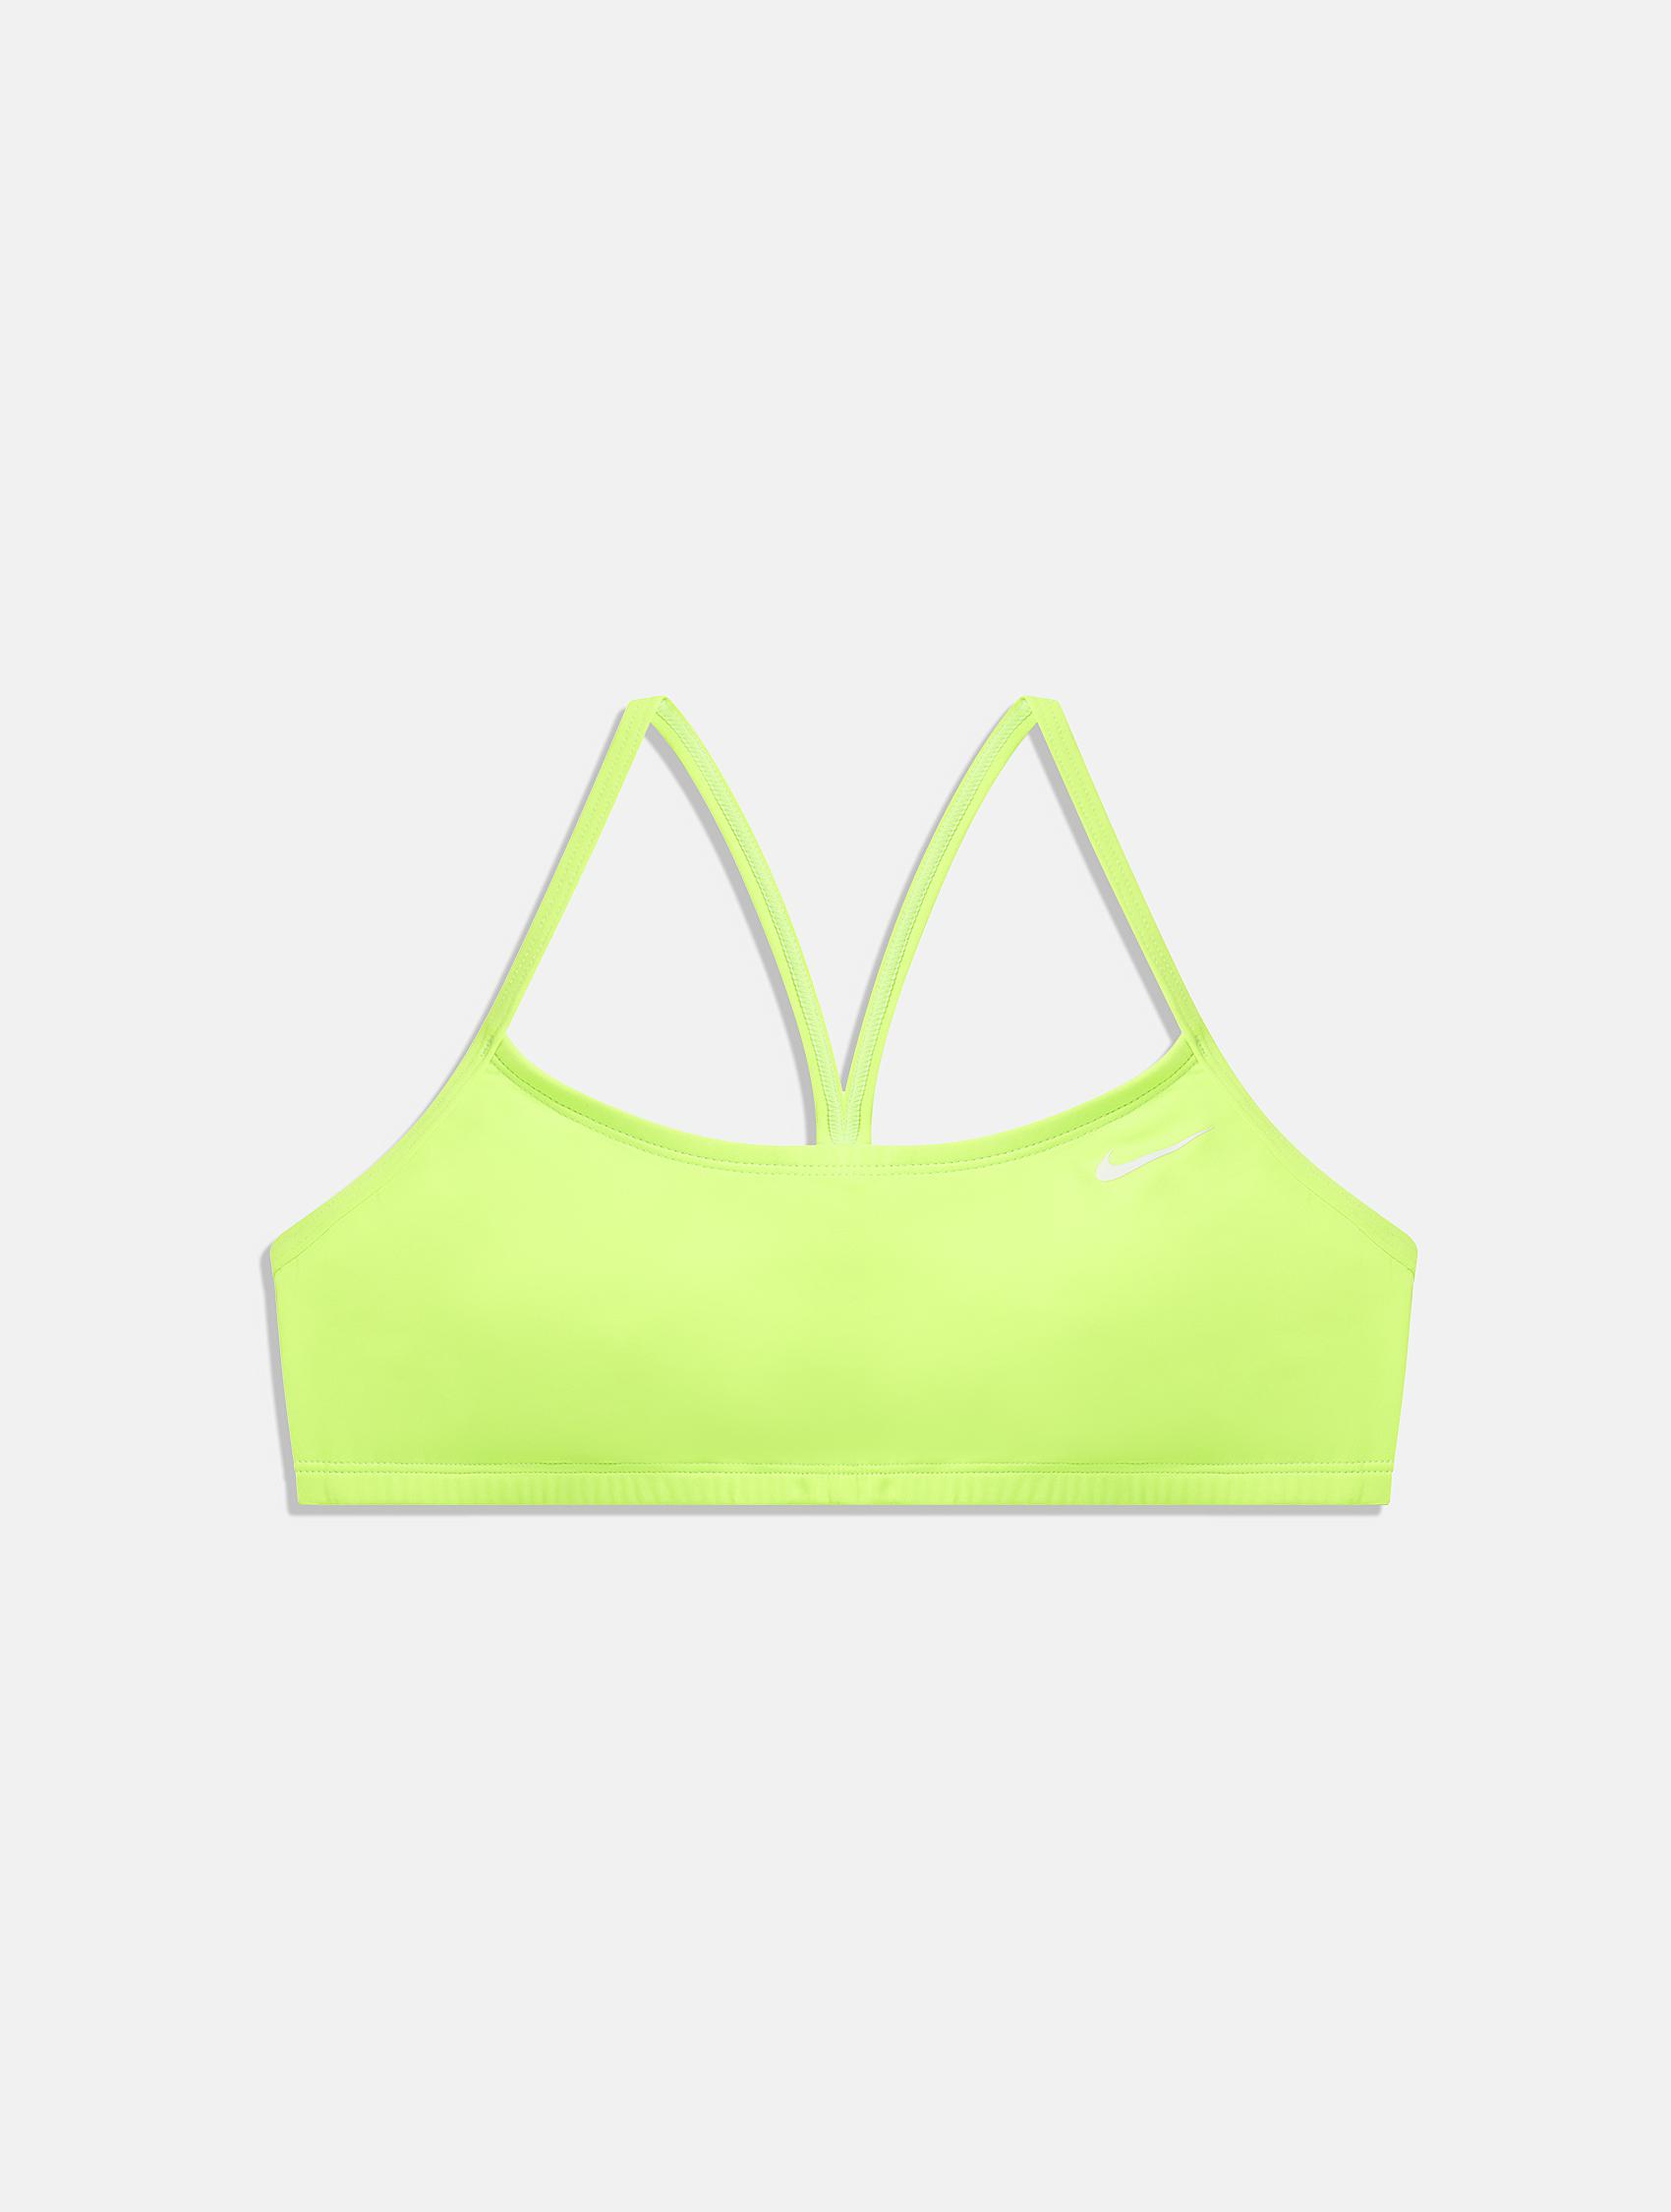 Light green Nike swimming top bra